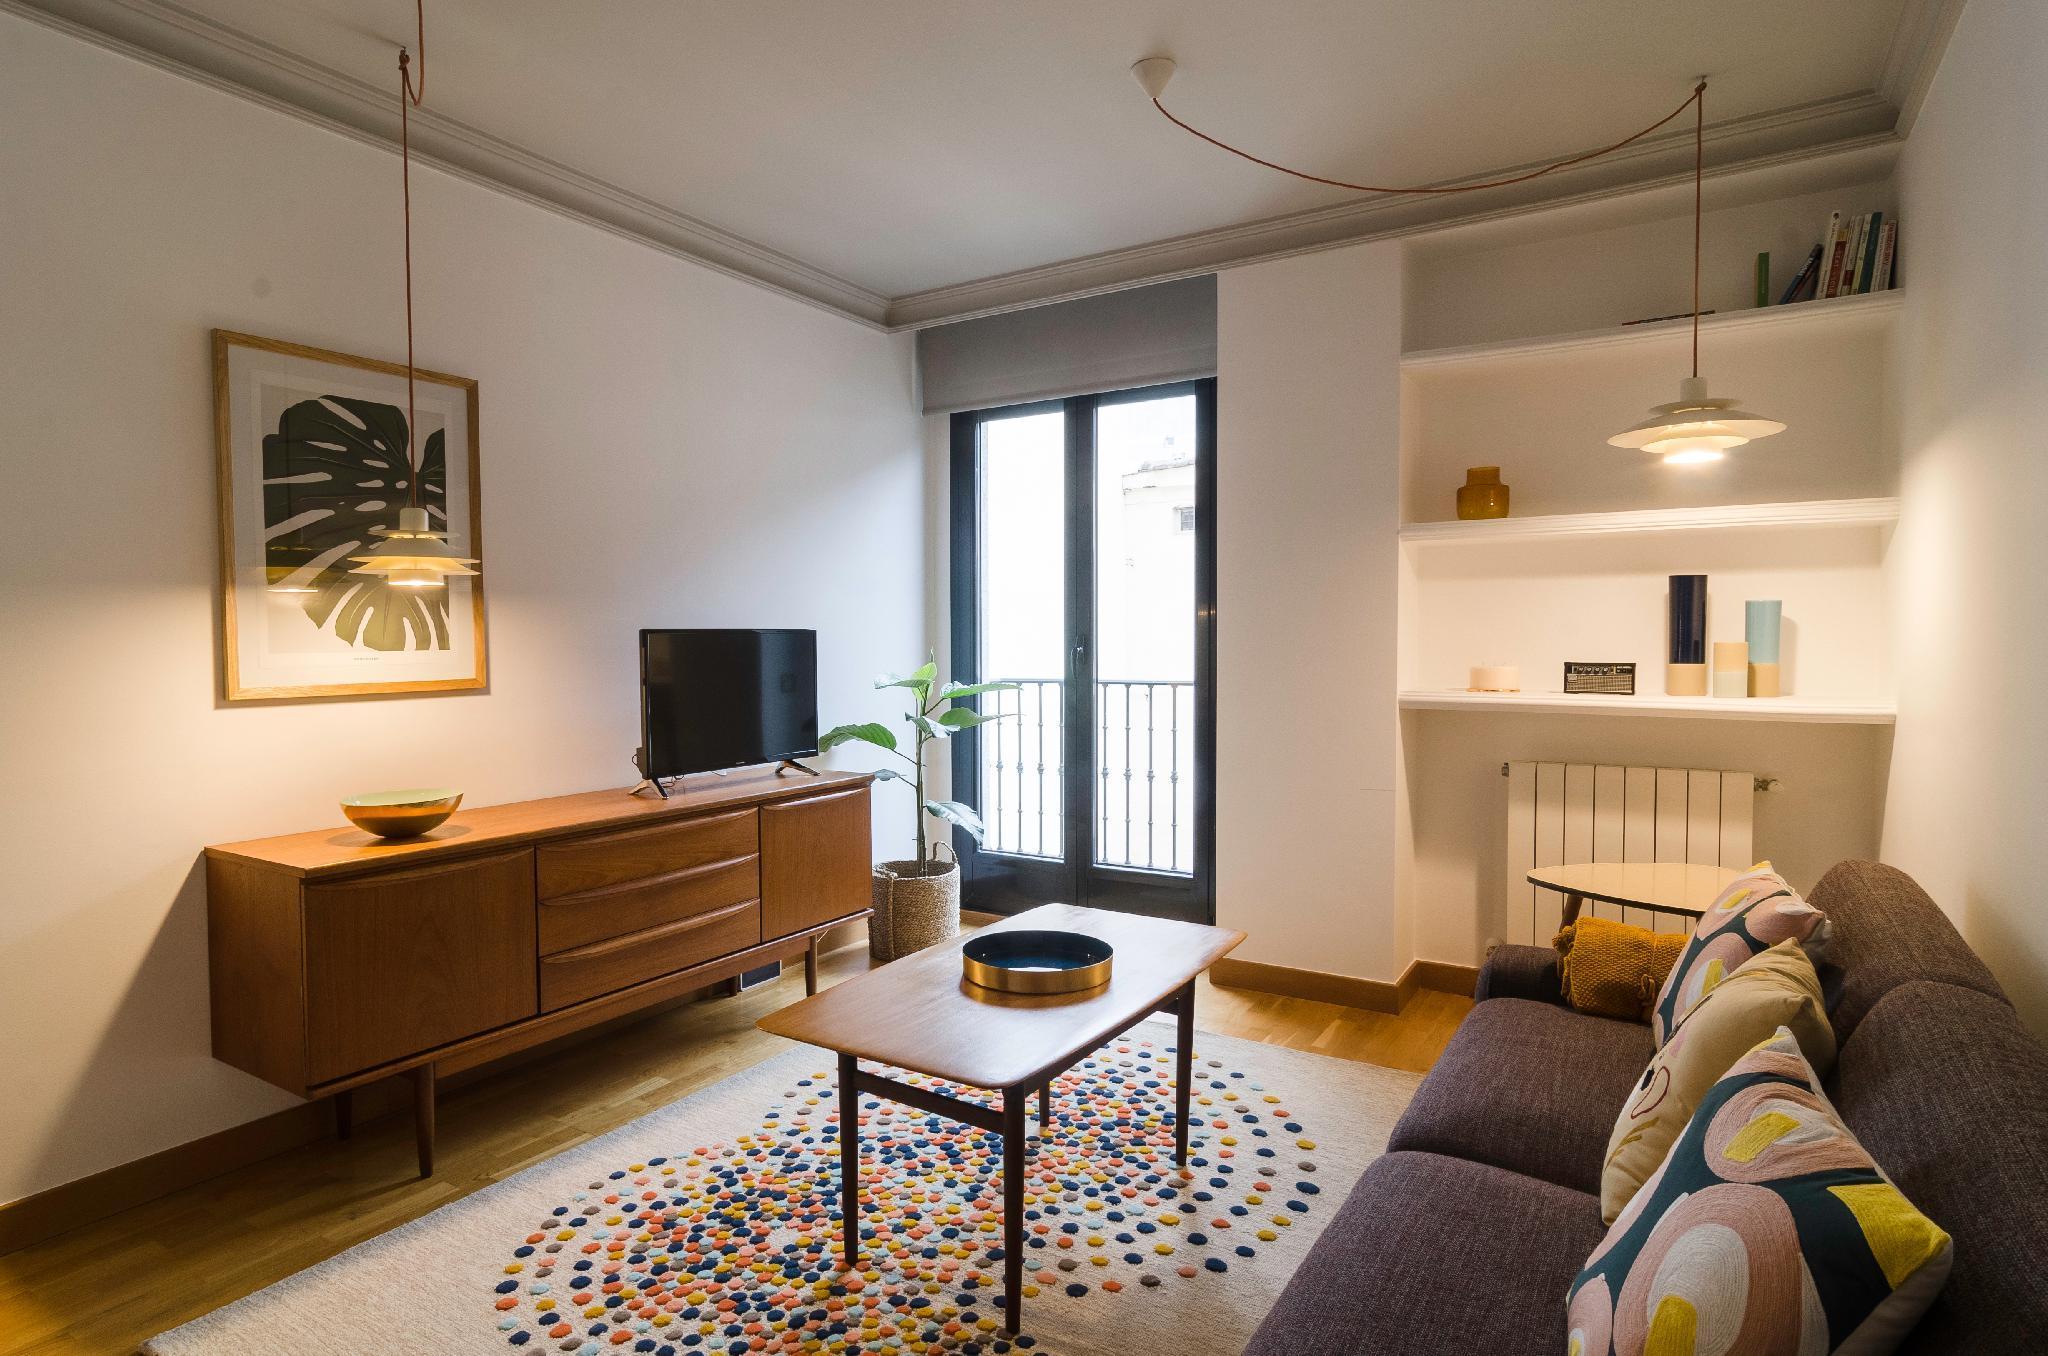 Cozy 1BR Apartment With Doorman In Trendy Chueca